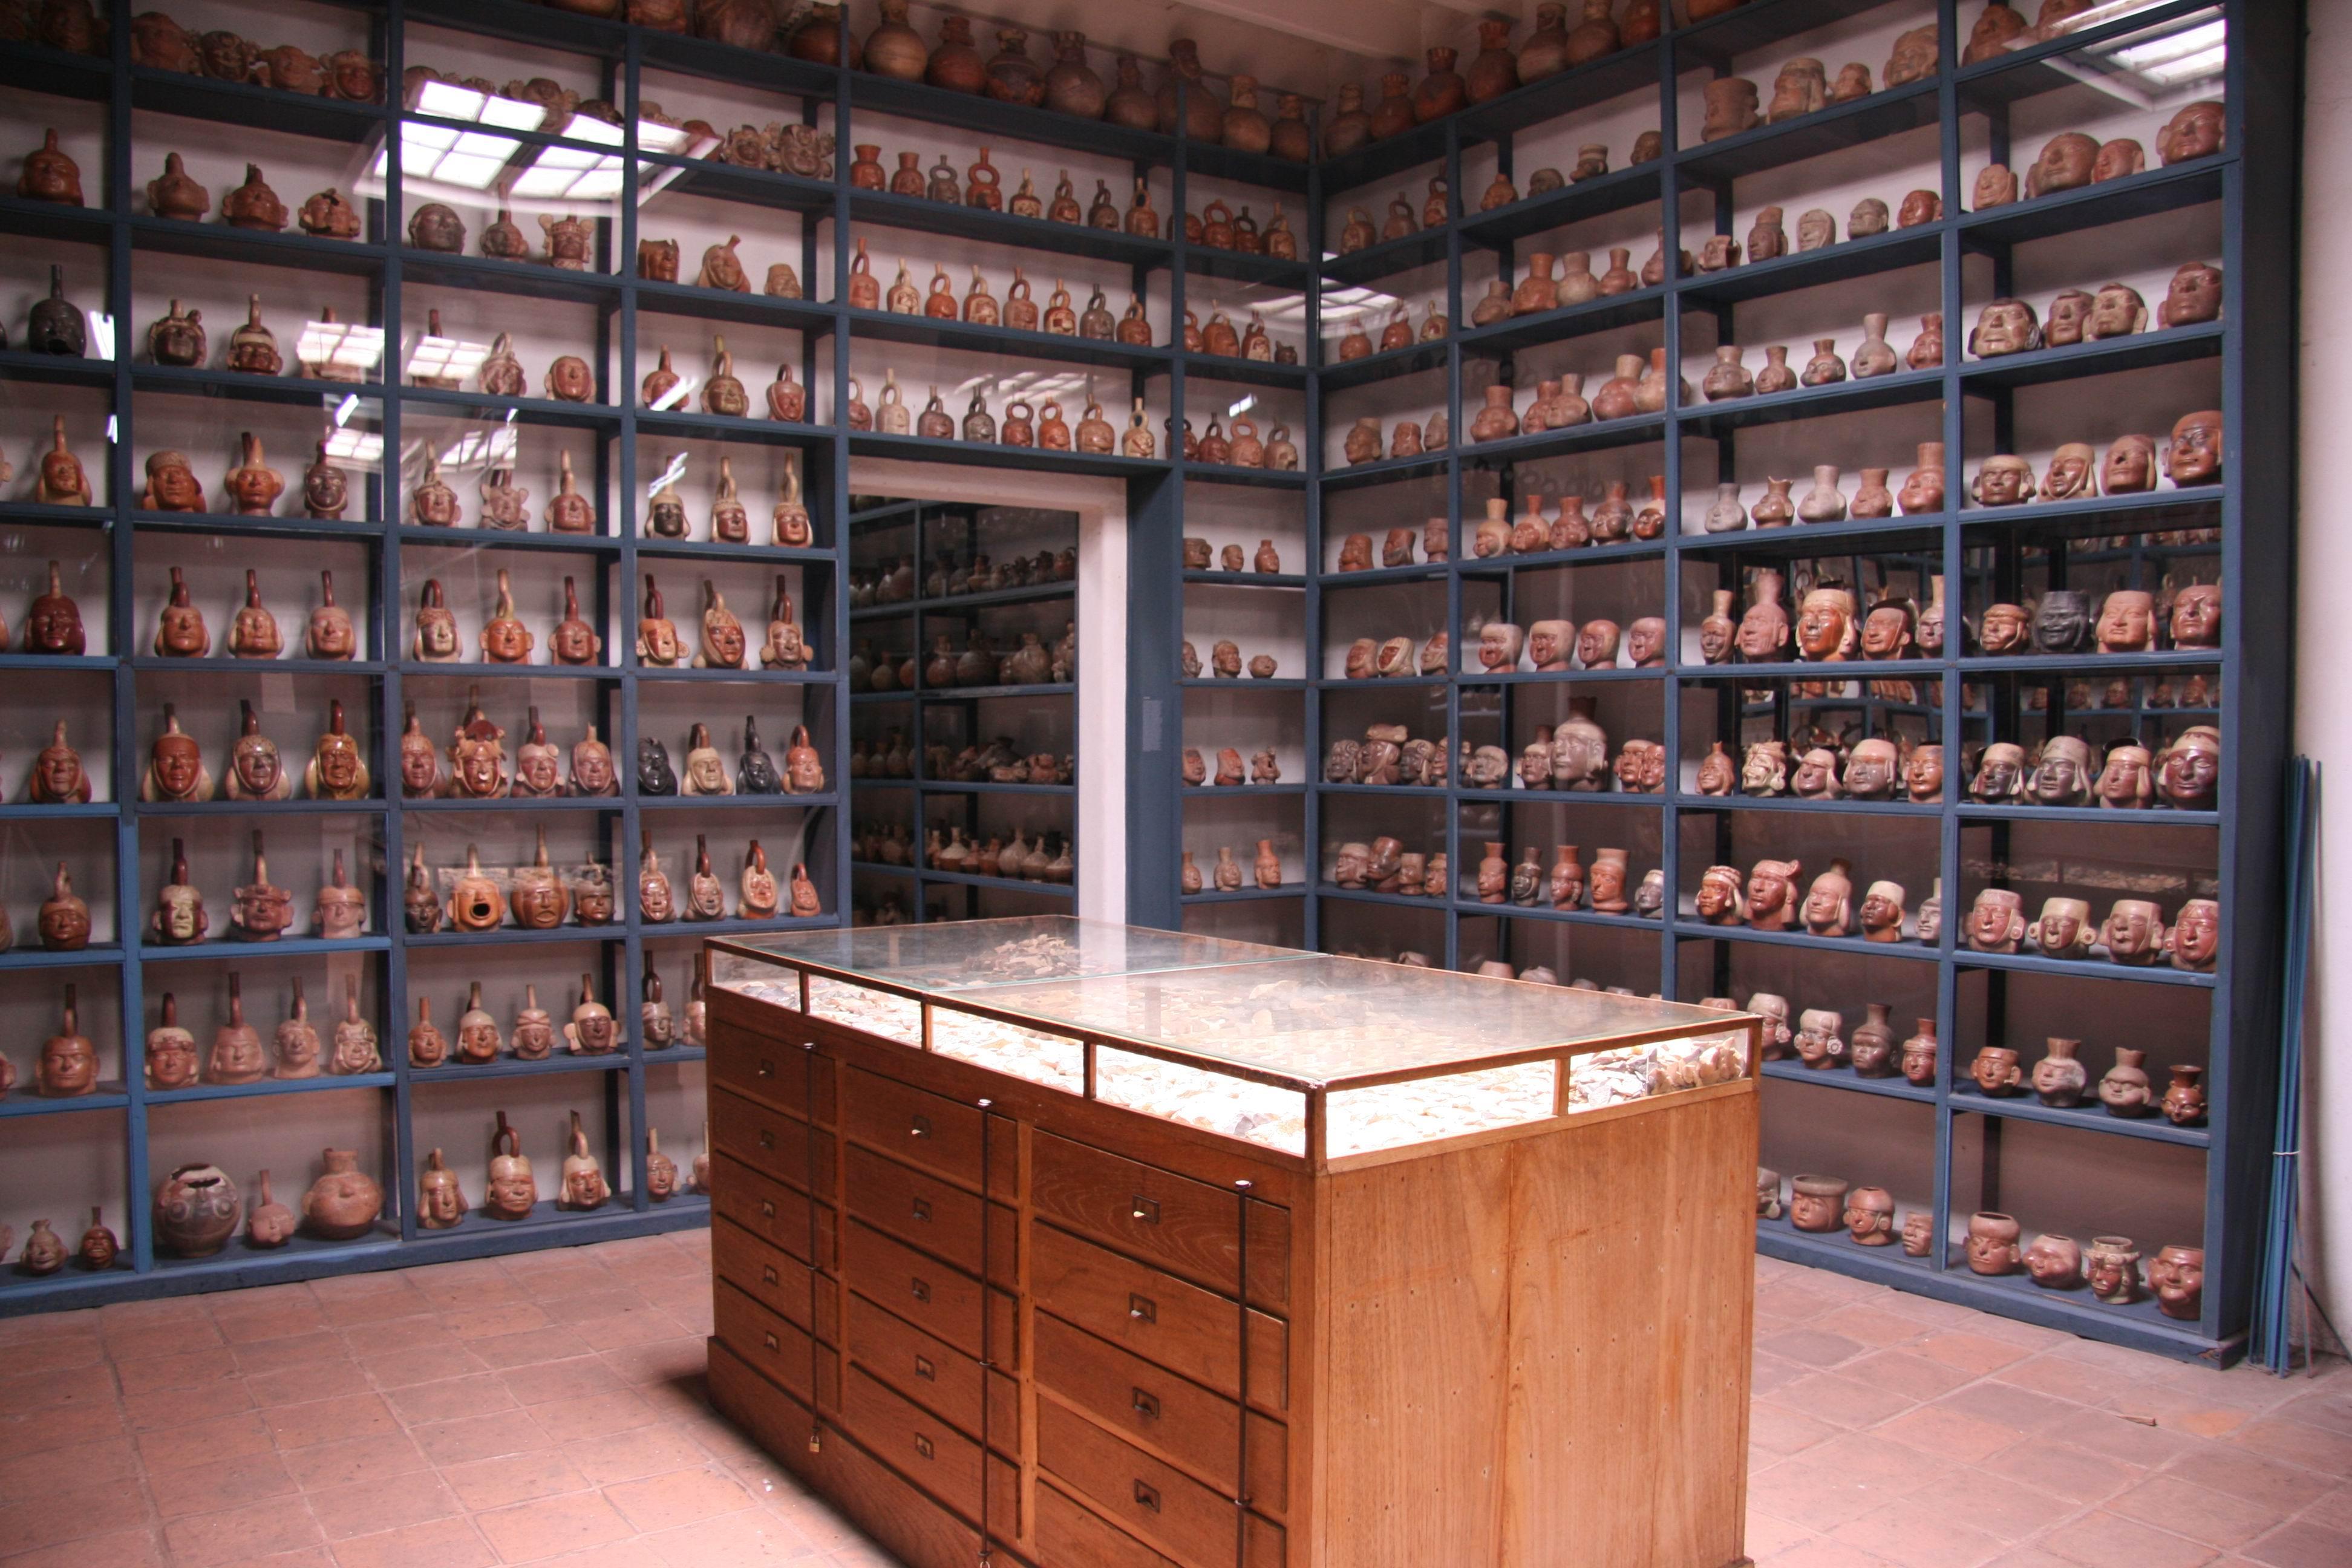 File:Storage Gallery.jpg - Wikipedia, the free encyclopedia: en.wikipedia.org/wiki/File:Storage_Gallery.jpg